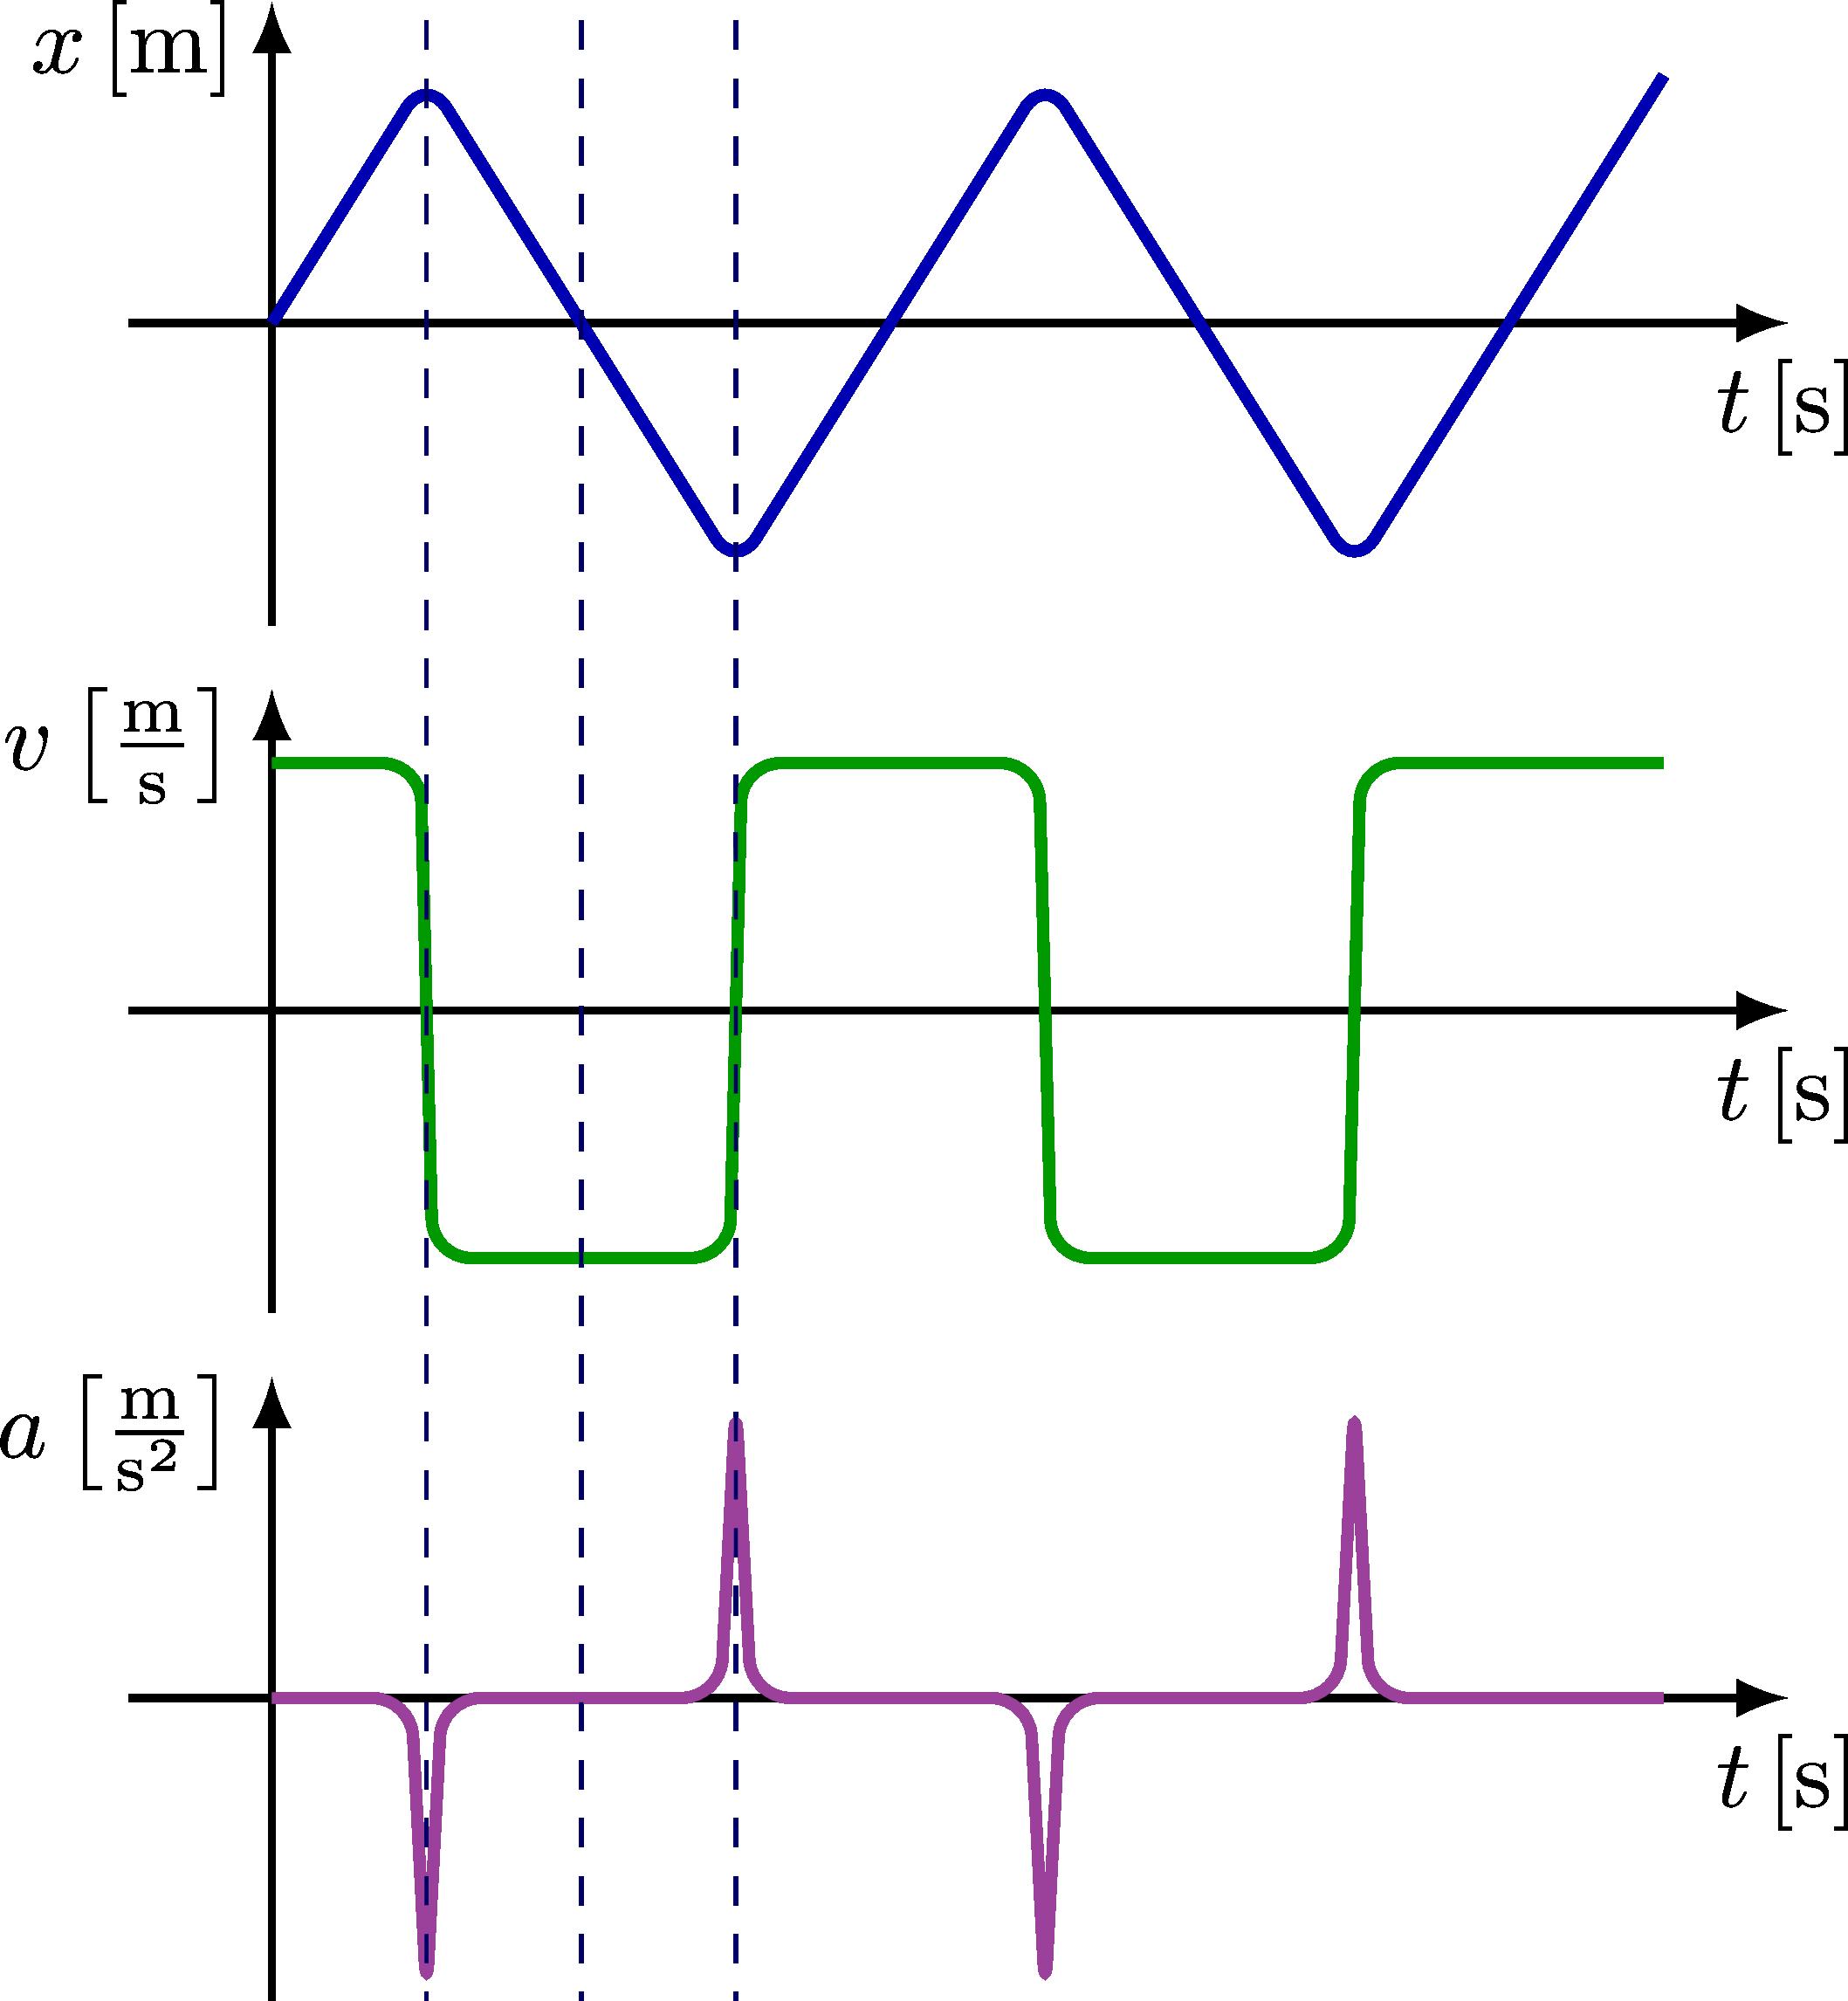 kinematics_curves_xva-007.png